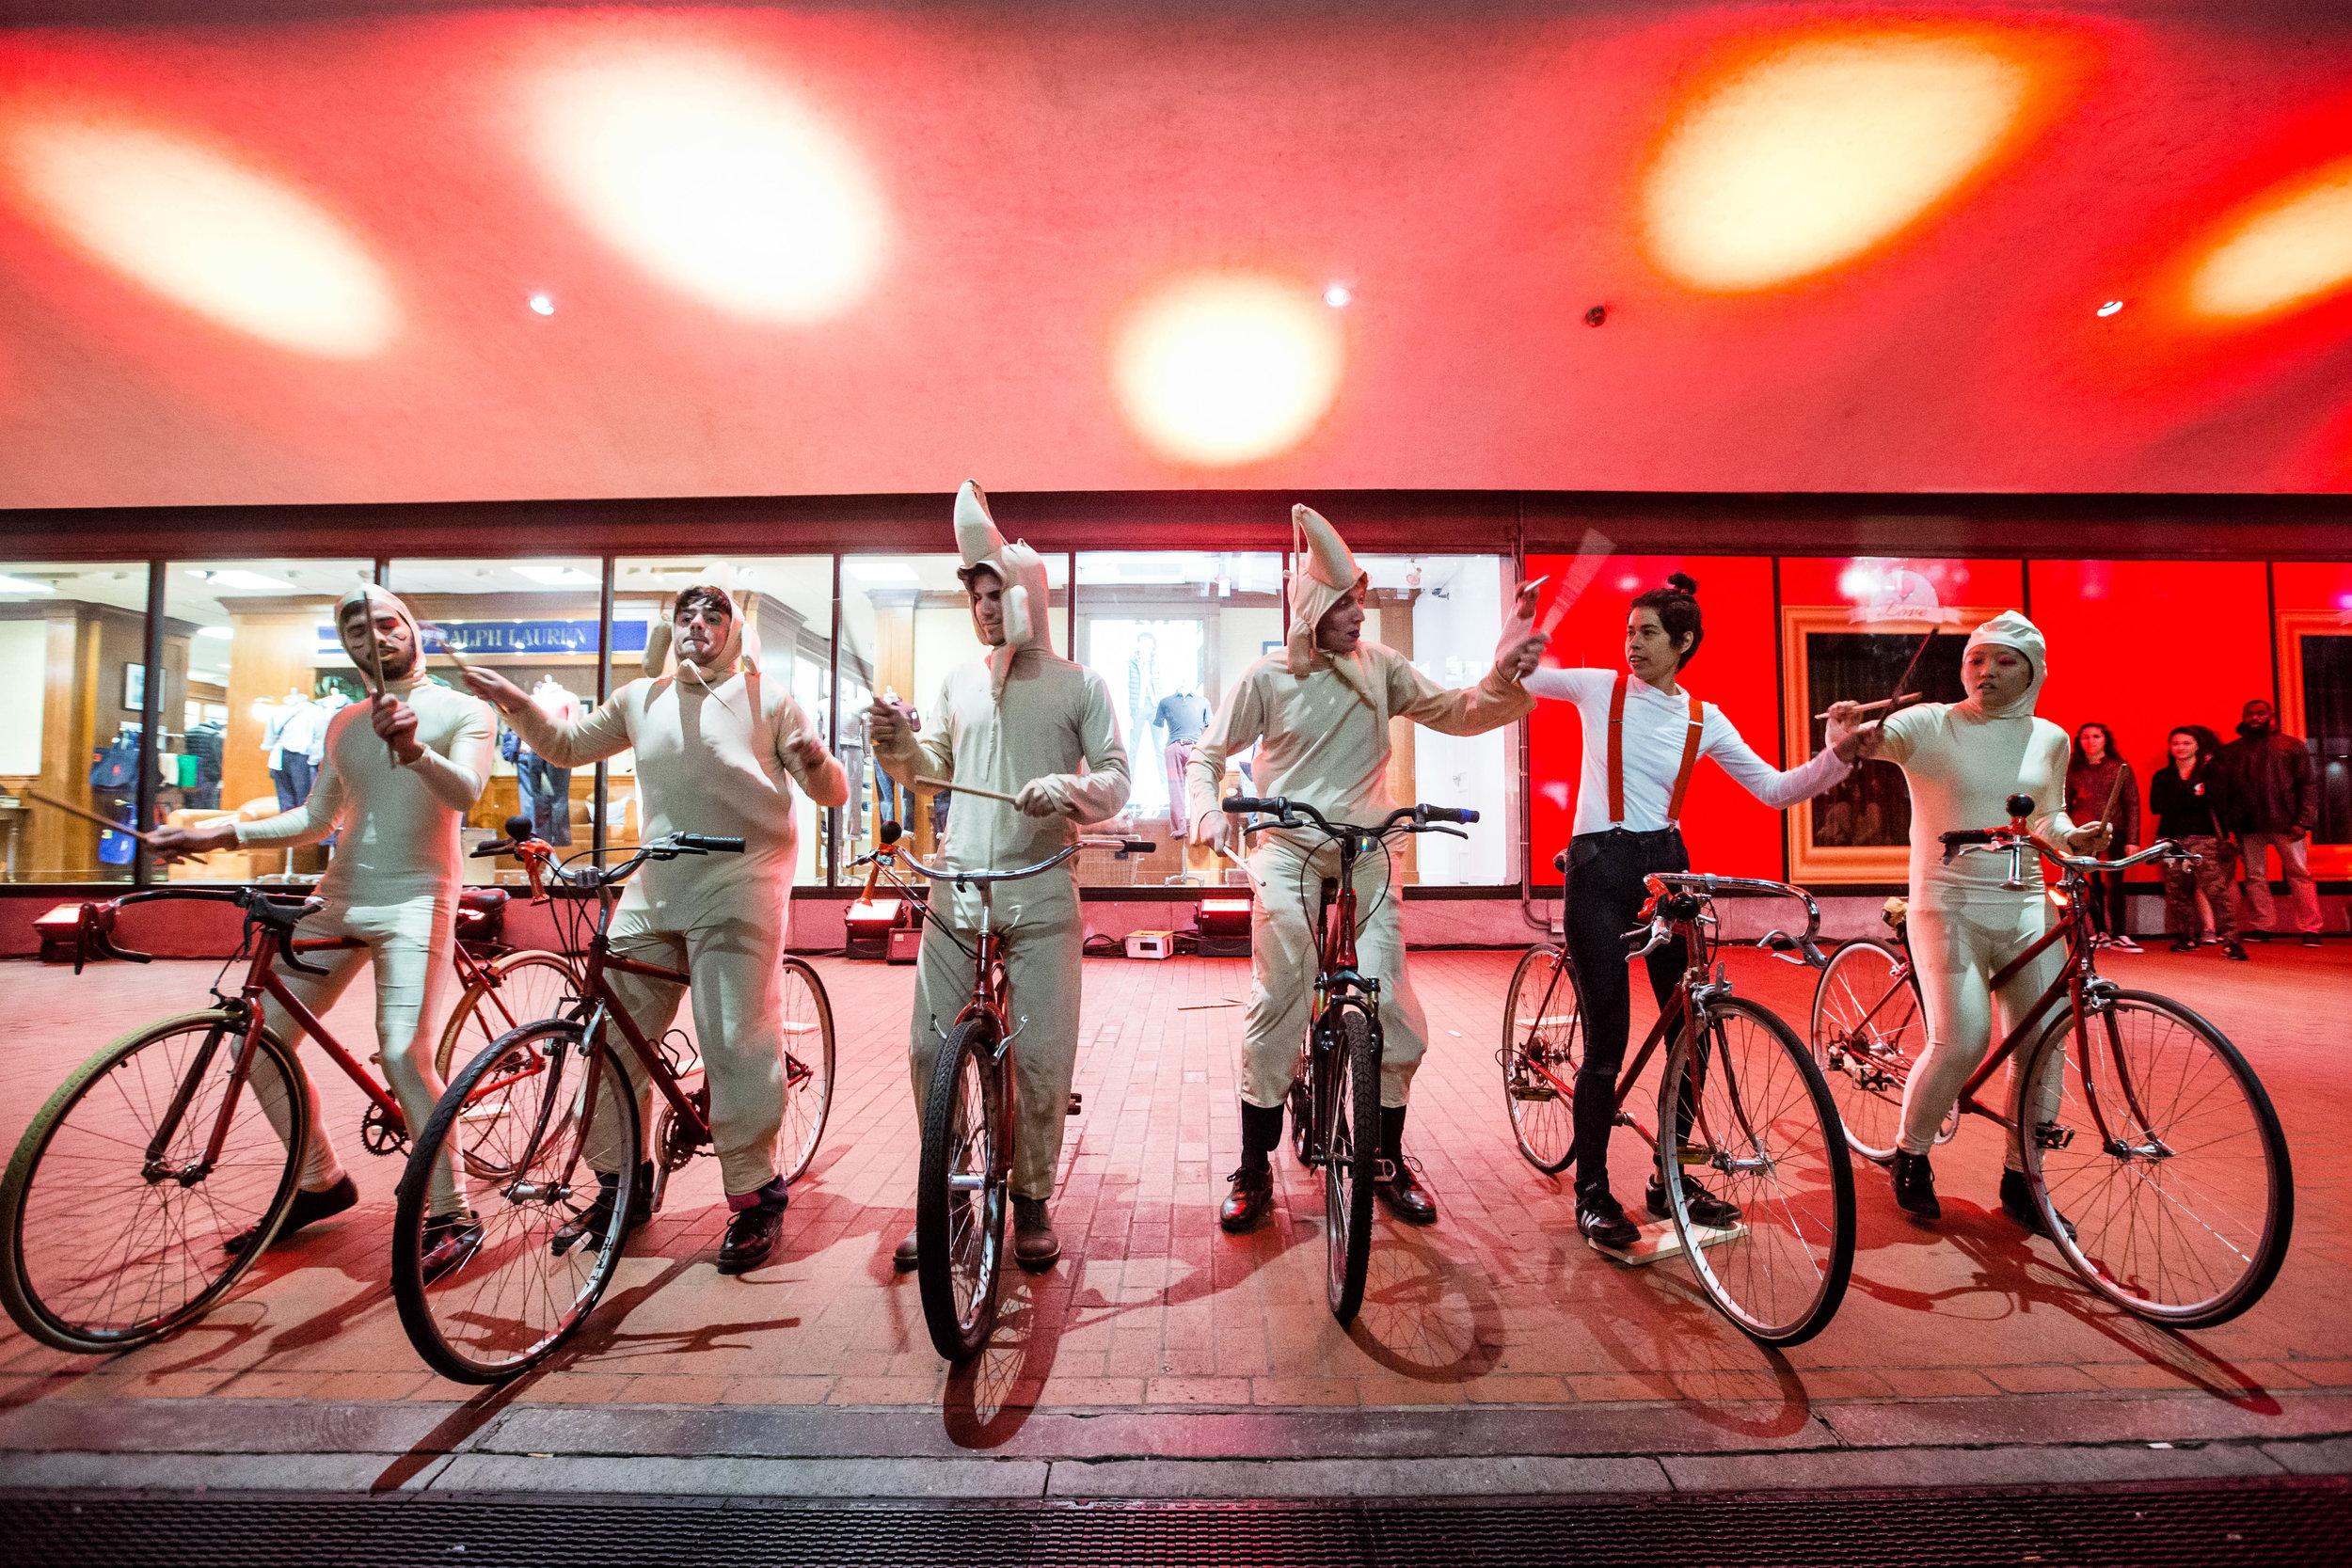 Ideas, Not Theories & Its Bicycle Orchestra_Reynaliz_Herrera_Illuminus 2017_Photo by Aram Boghosian_1.jpg